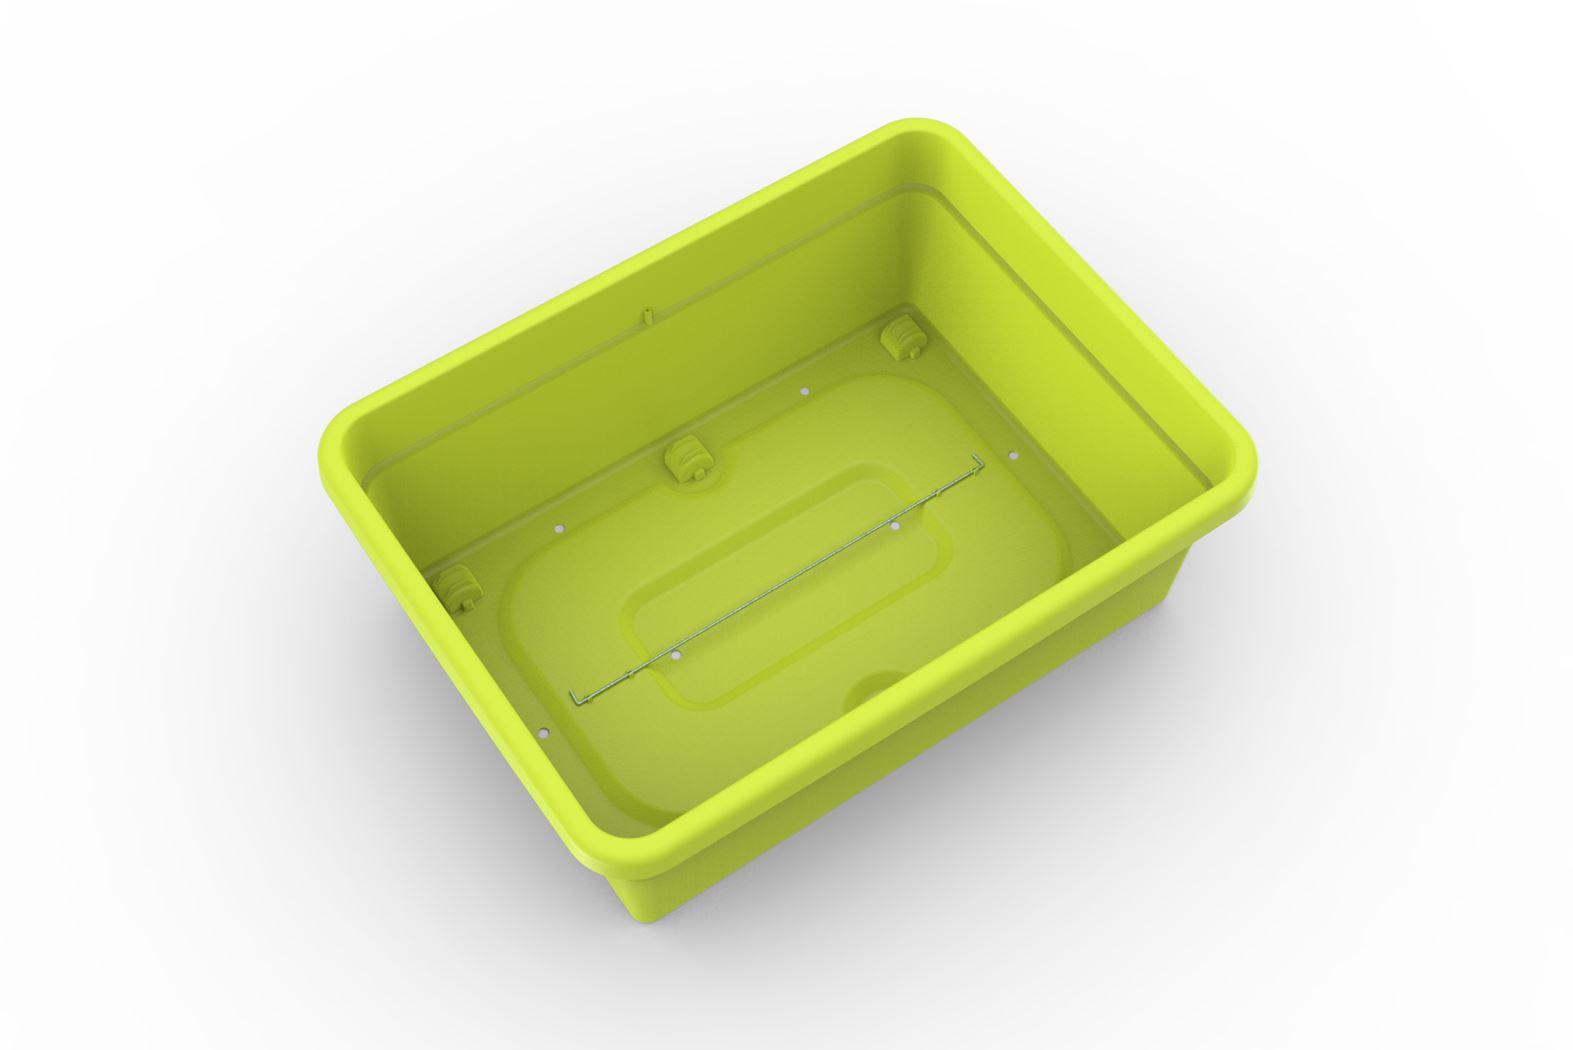 elho-green-basics-moestuin-op-wielen-lime-groen